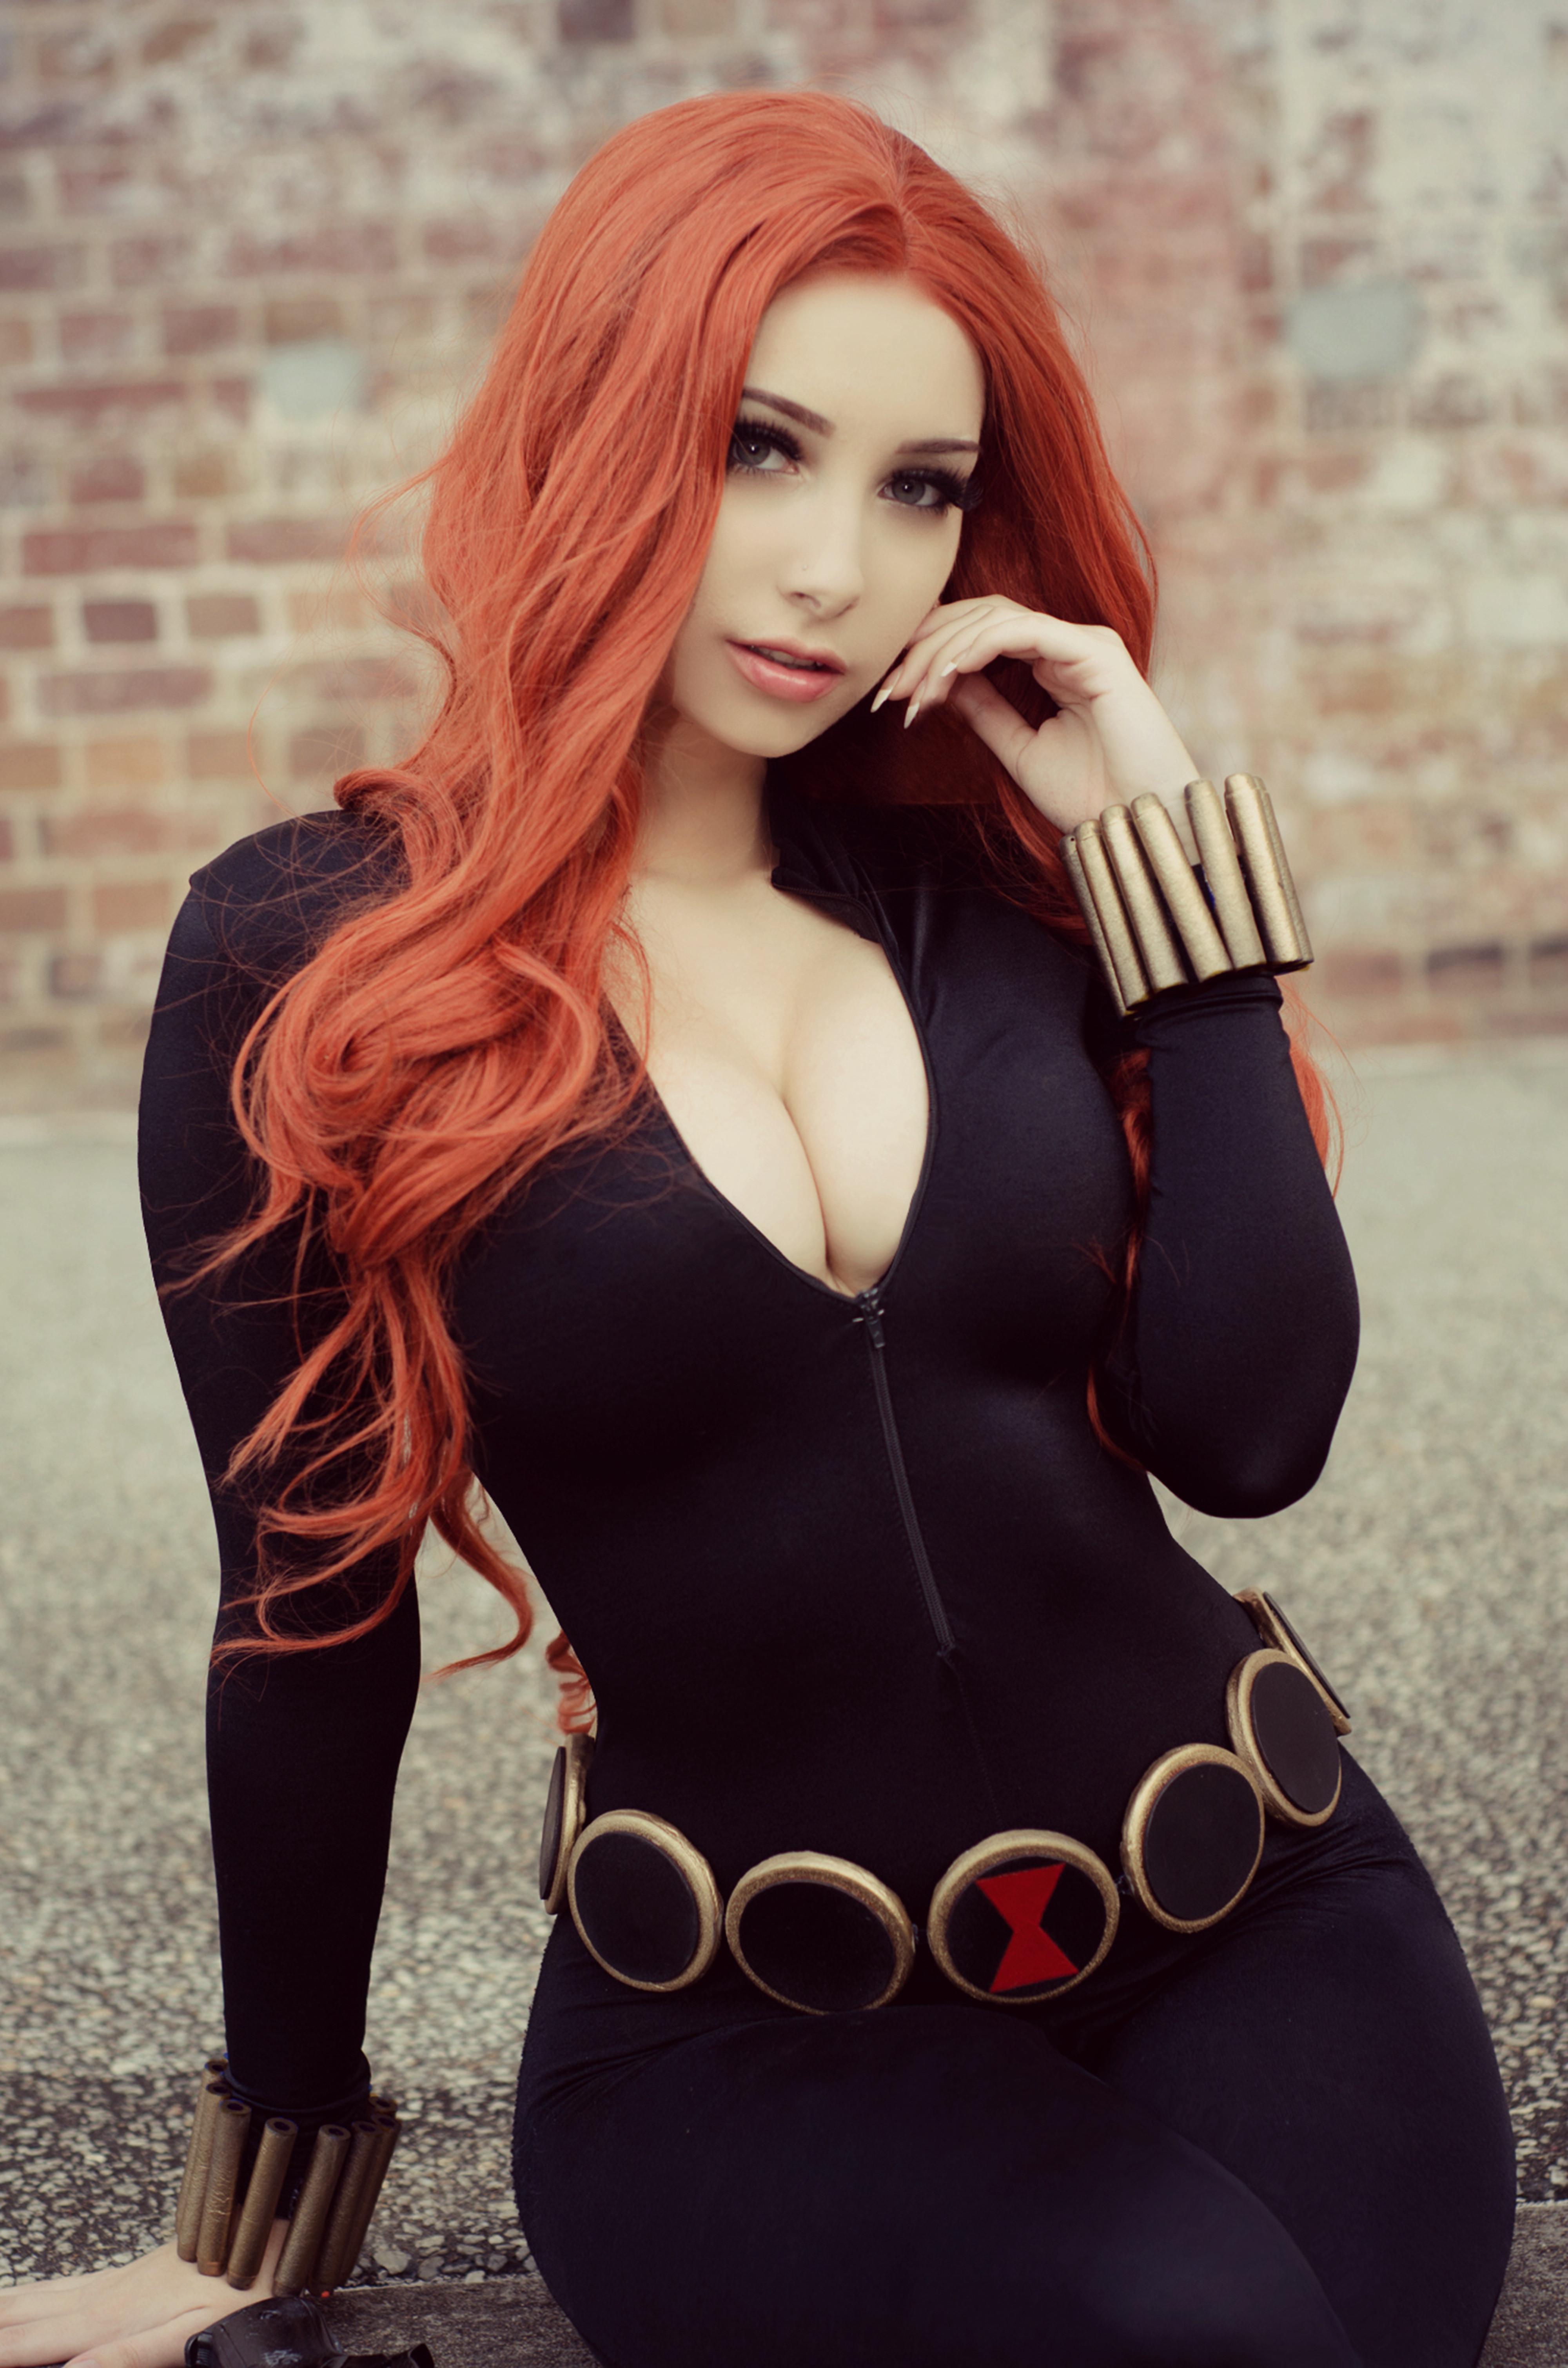 Beke Jacoba - Black Widow (有本事的特工~~欧美小姐姐~)-蜜桃畅享